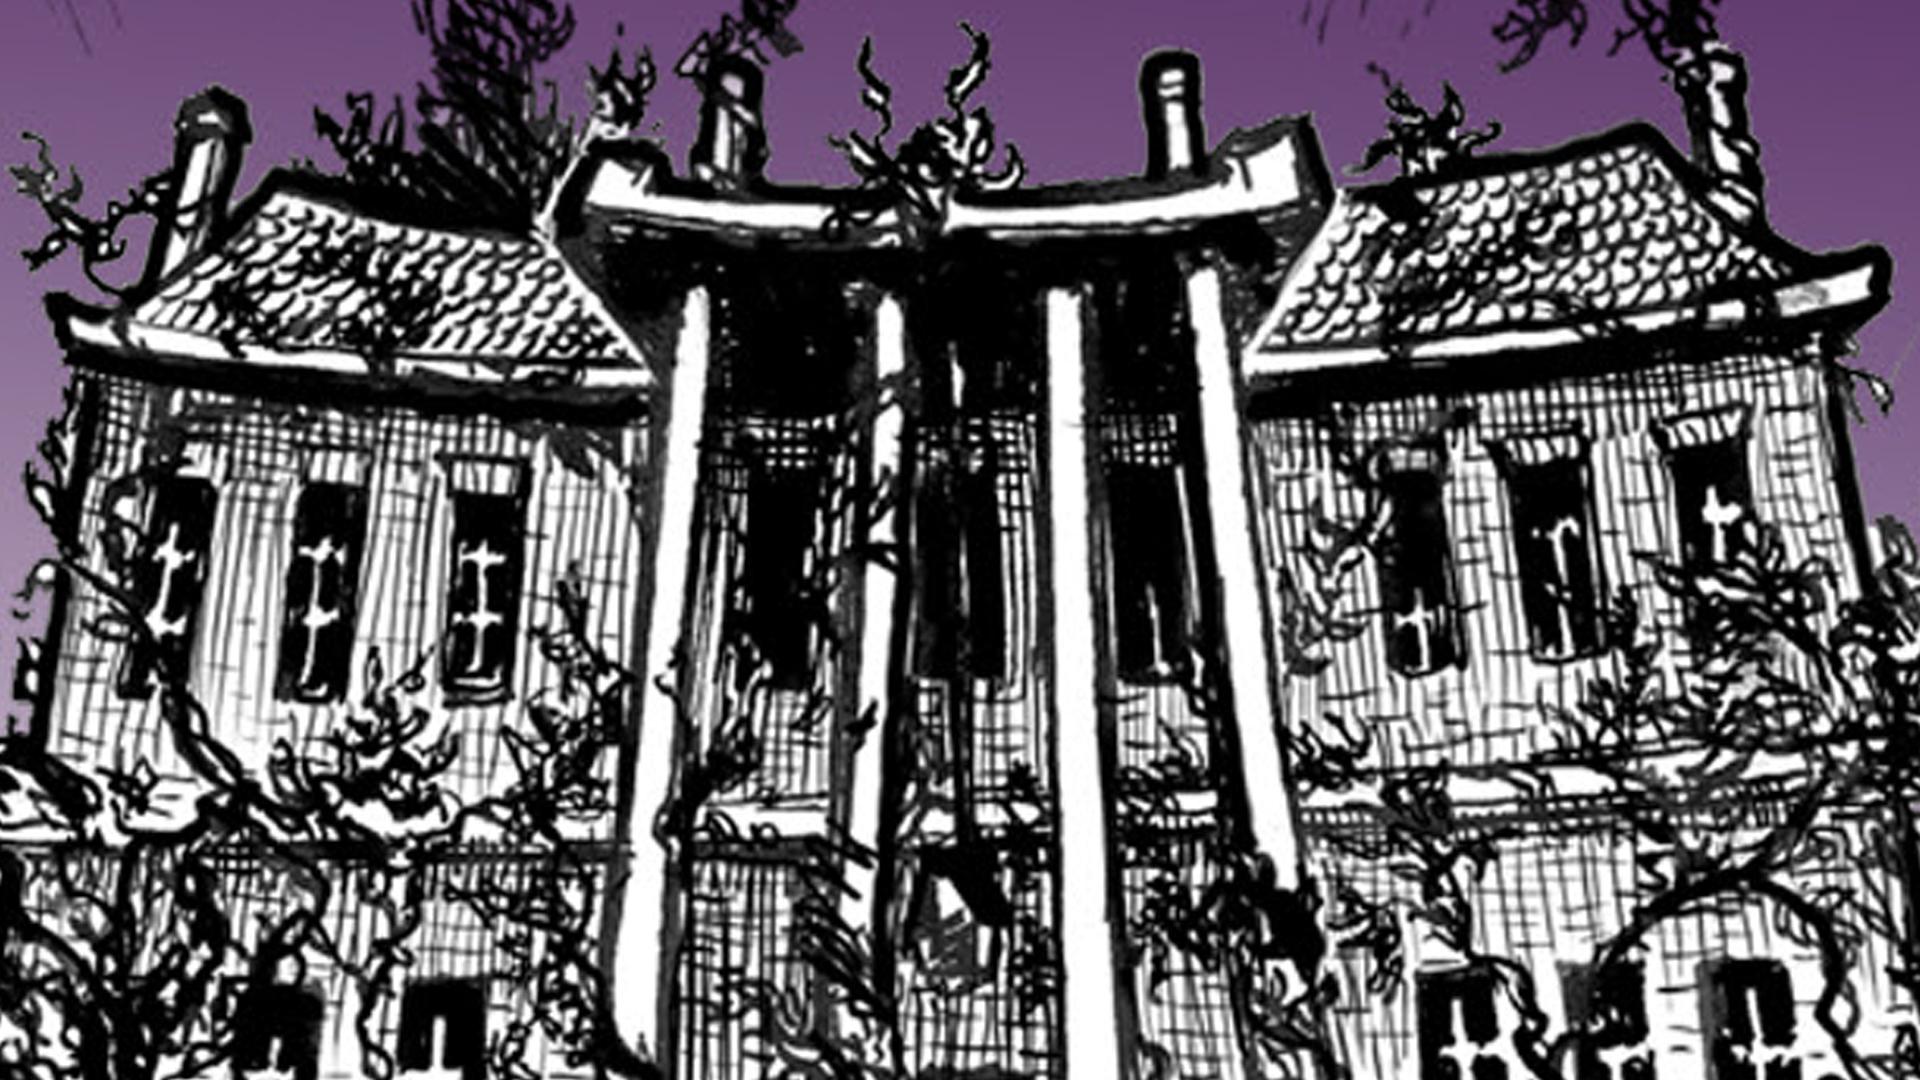 Gloomier: A Night at Hemlock Hall artwork